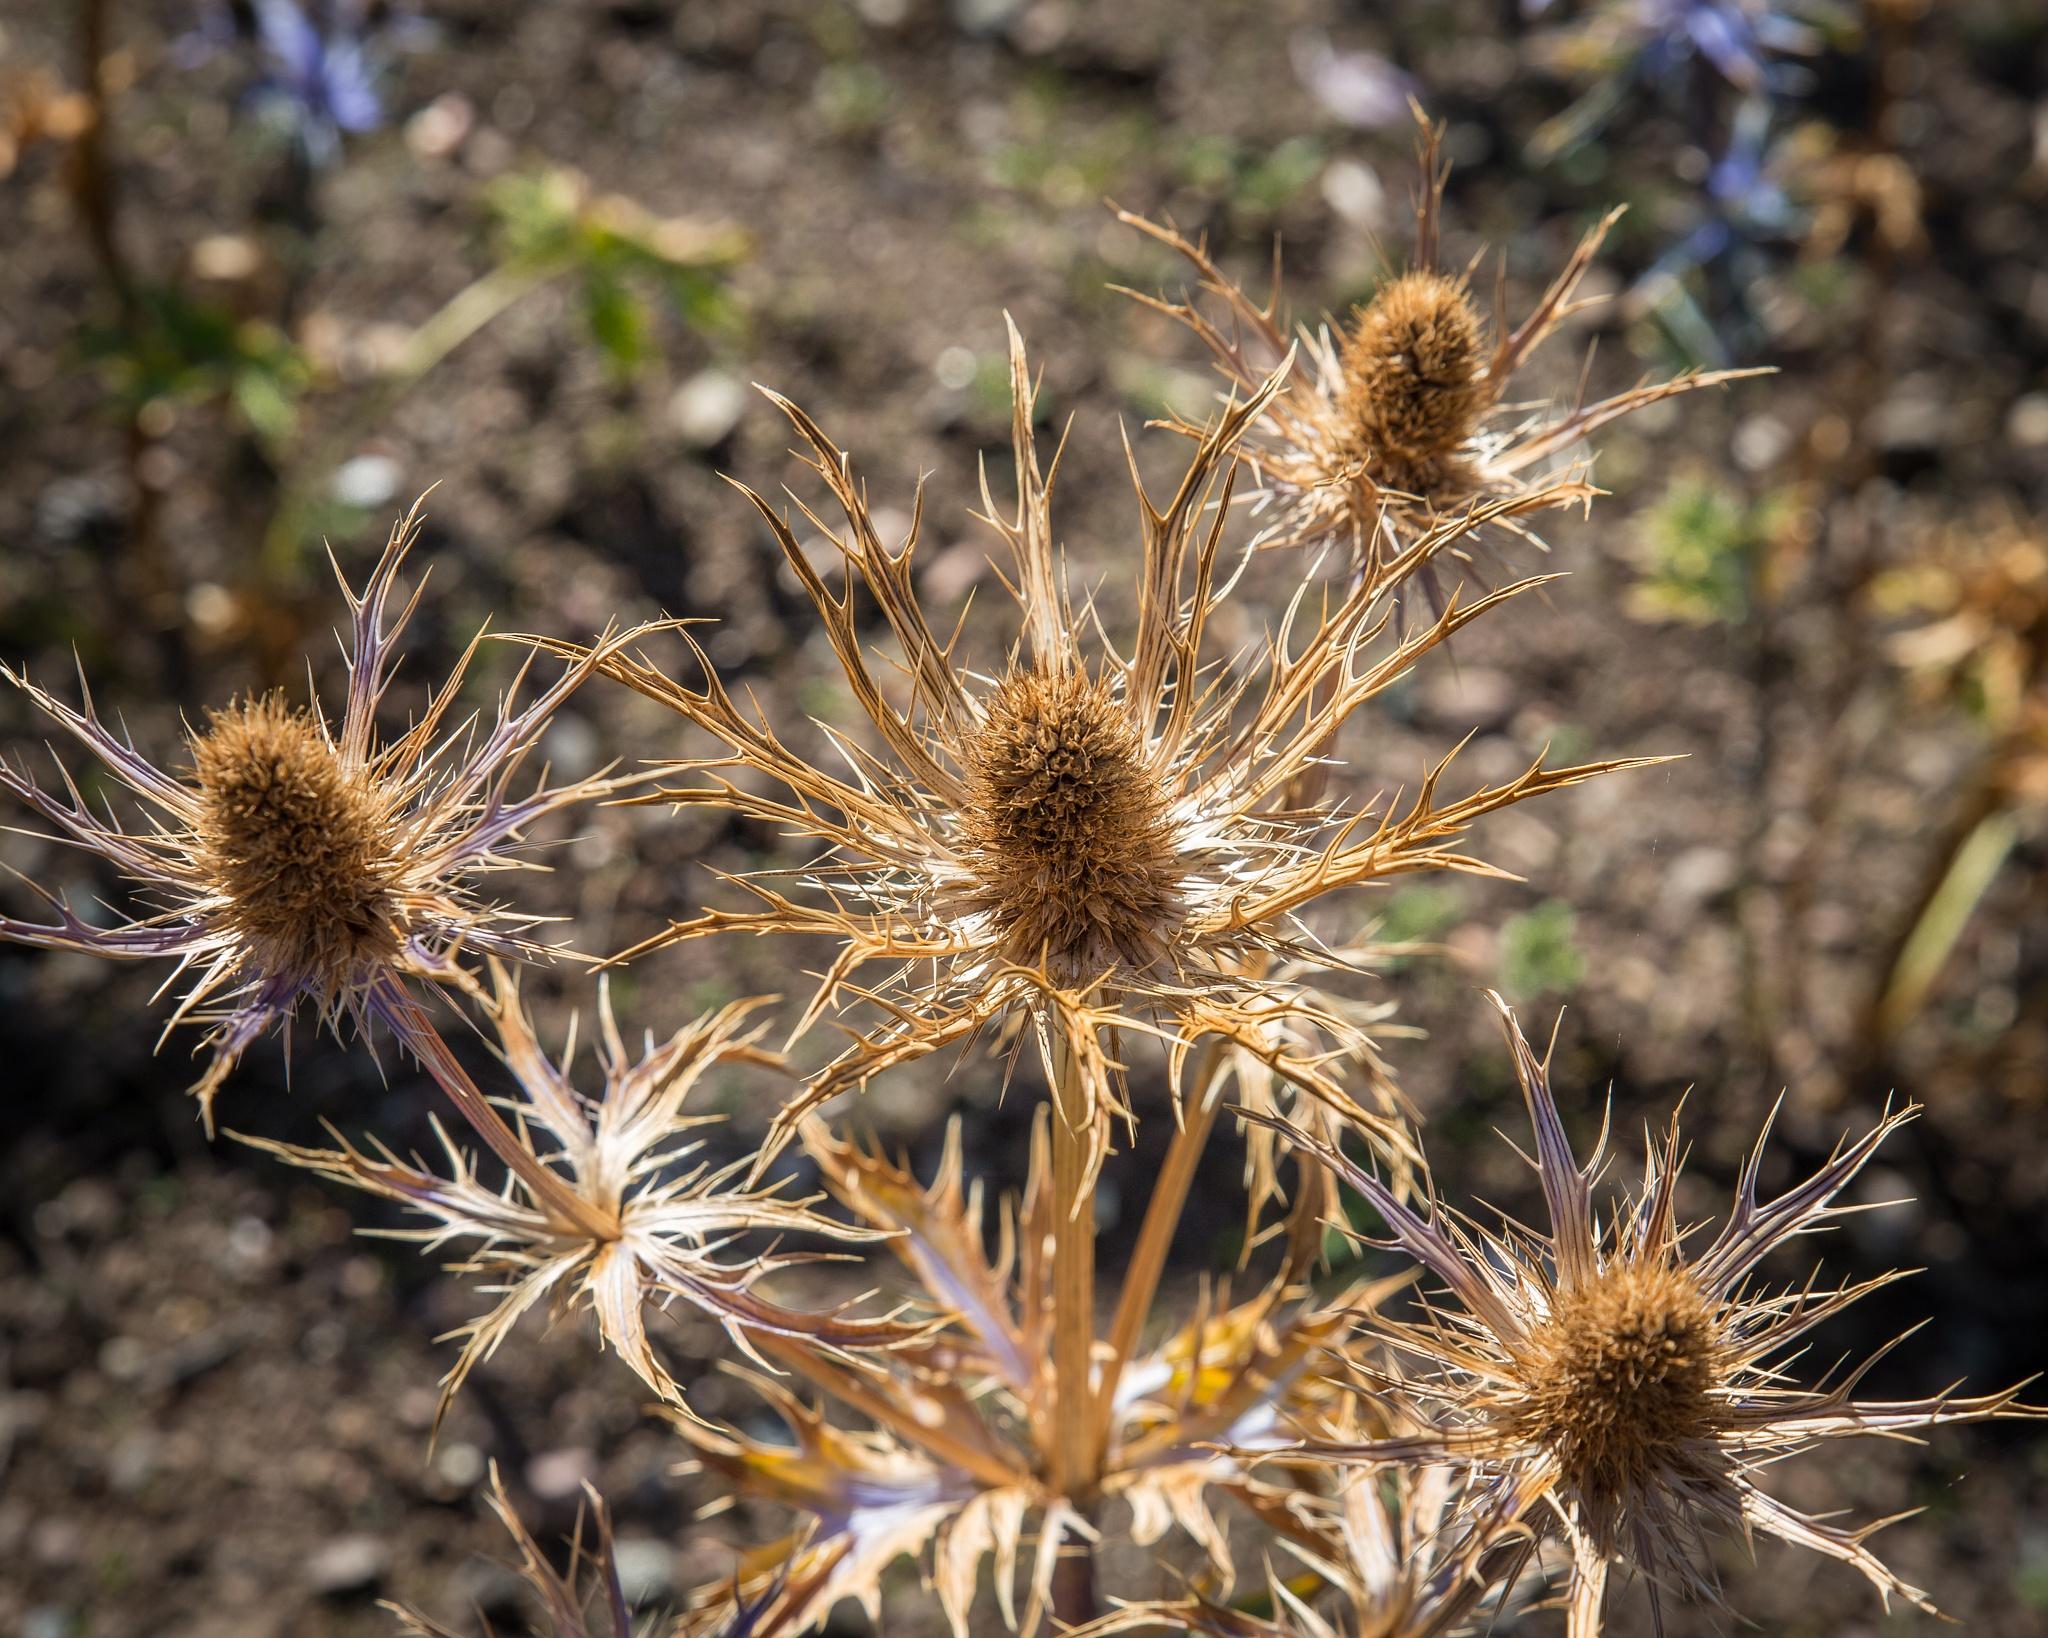 Spiky by isegarth